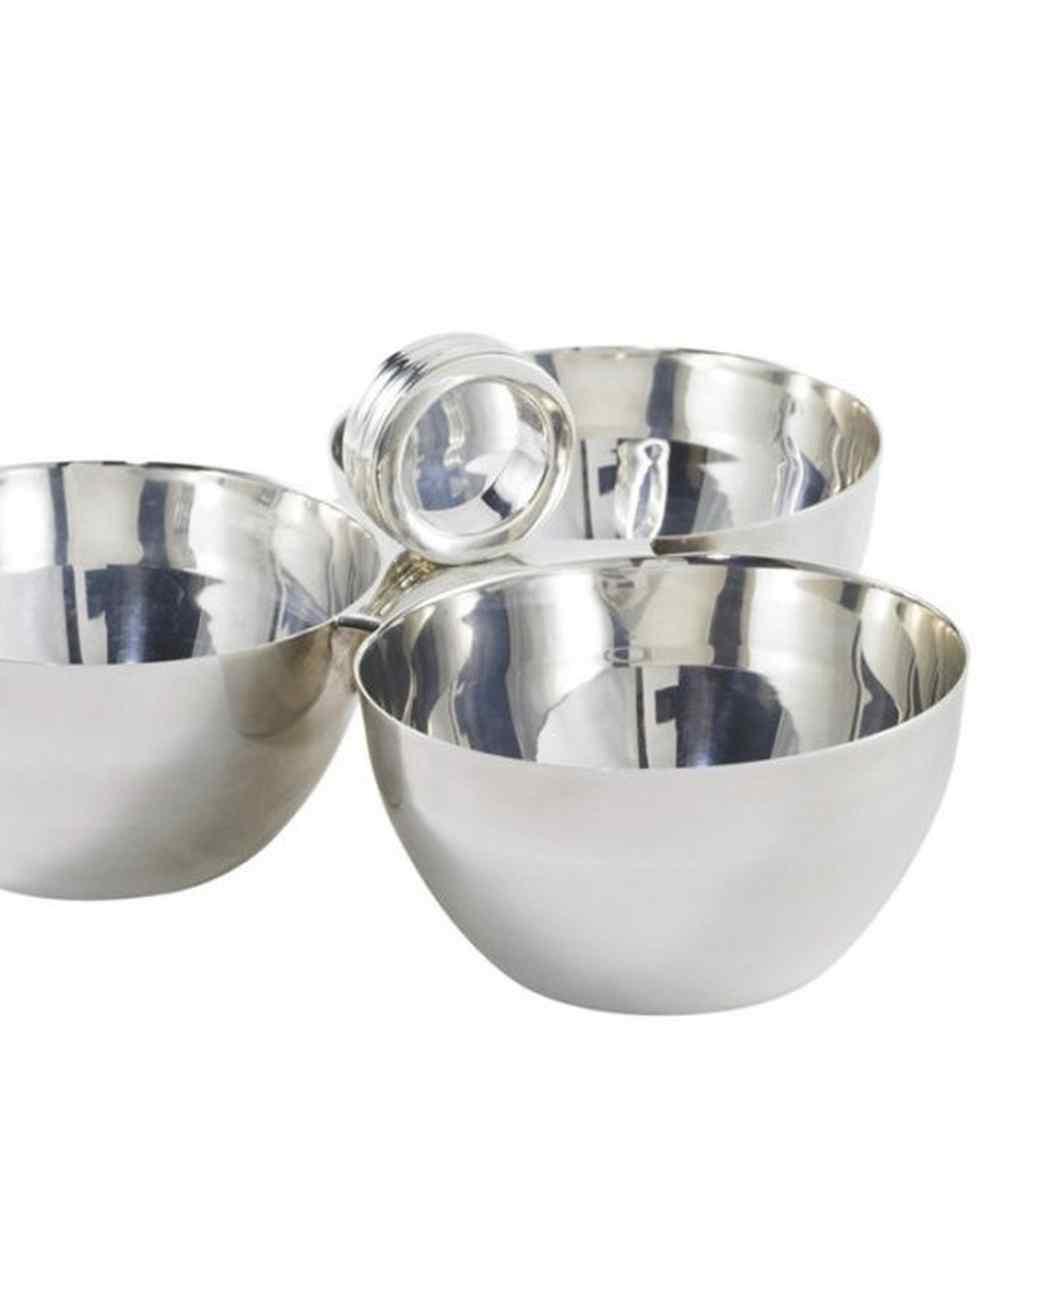 three-nut bowl